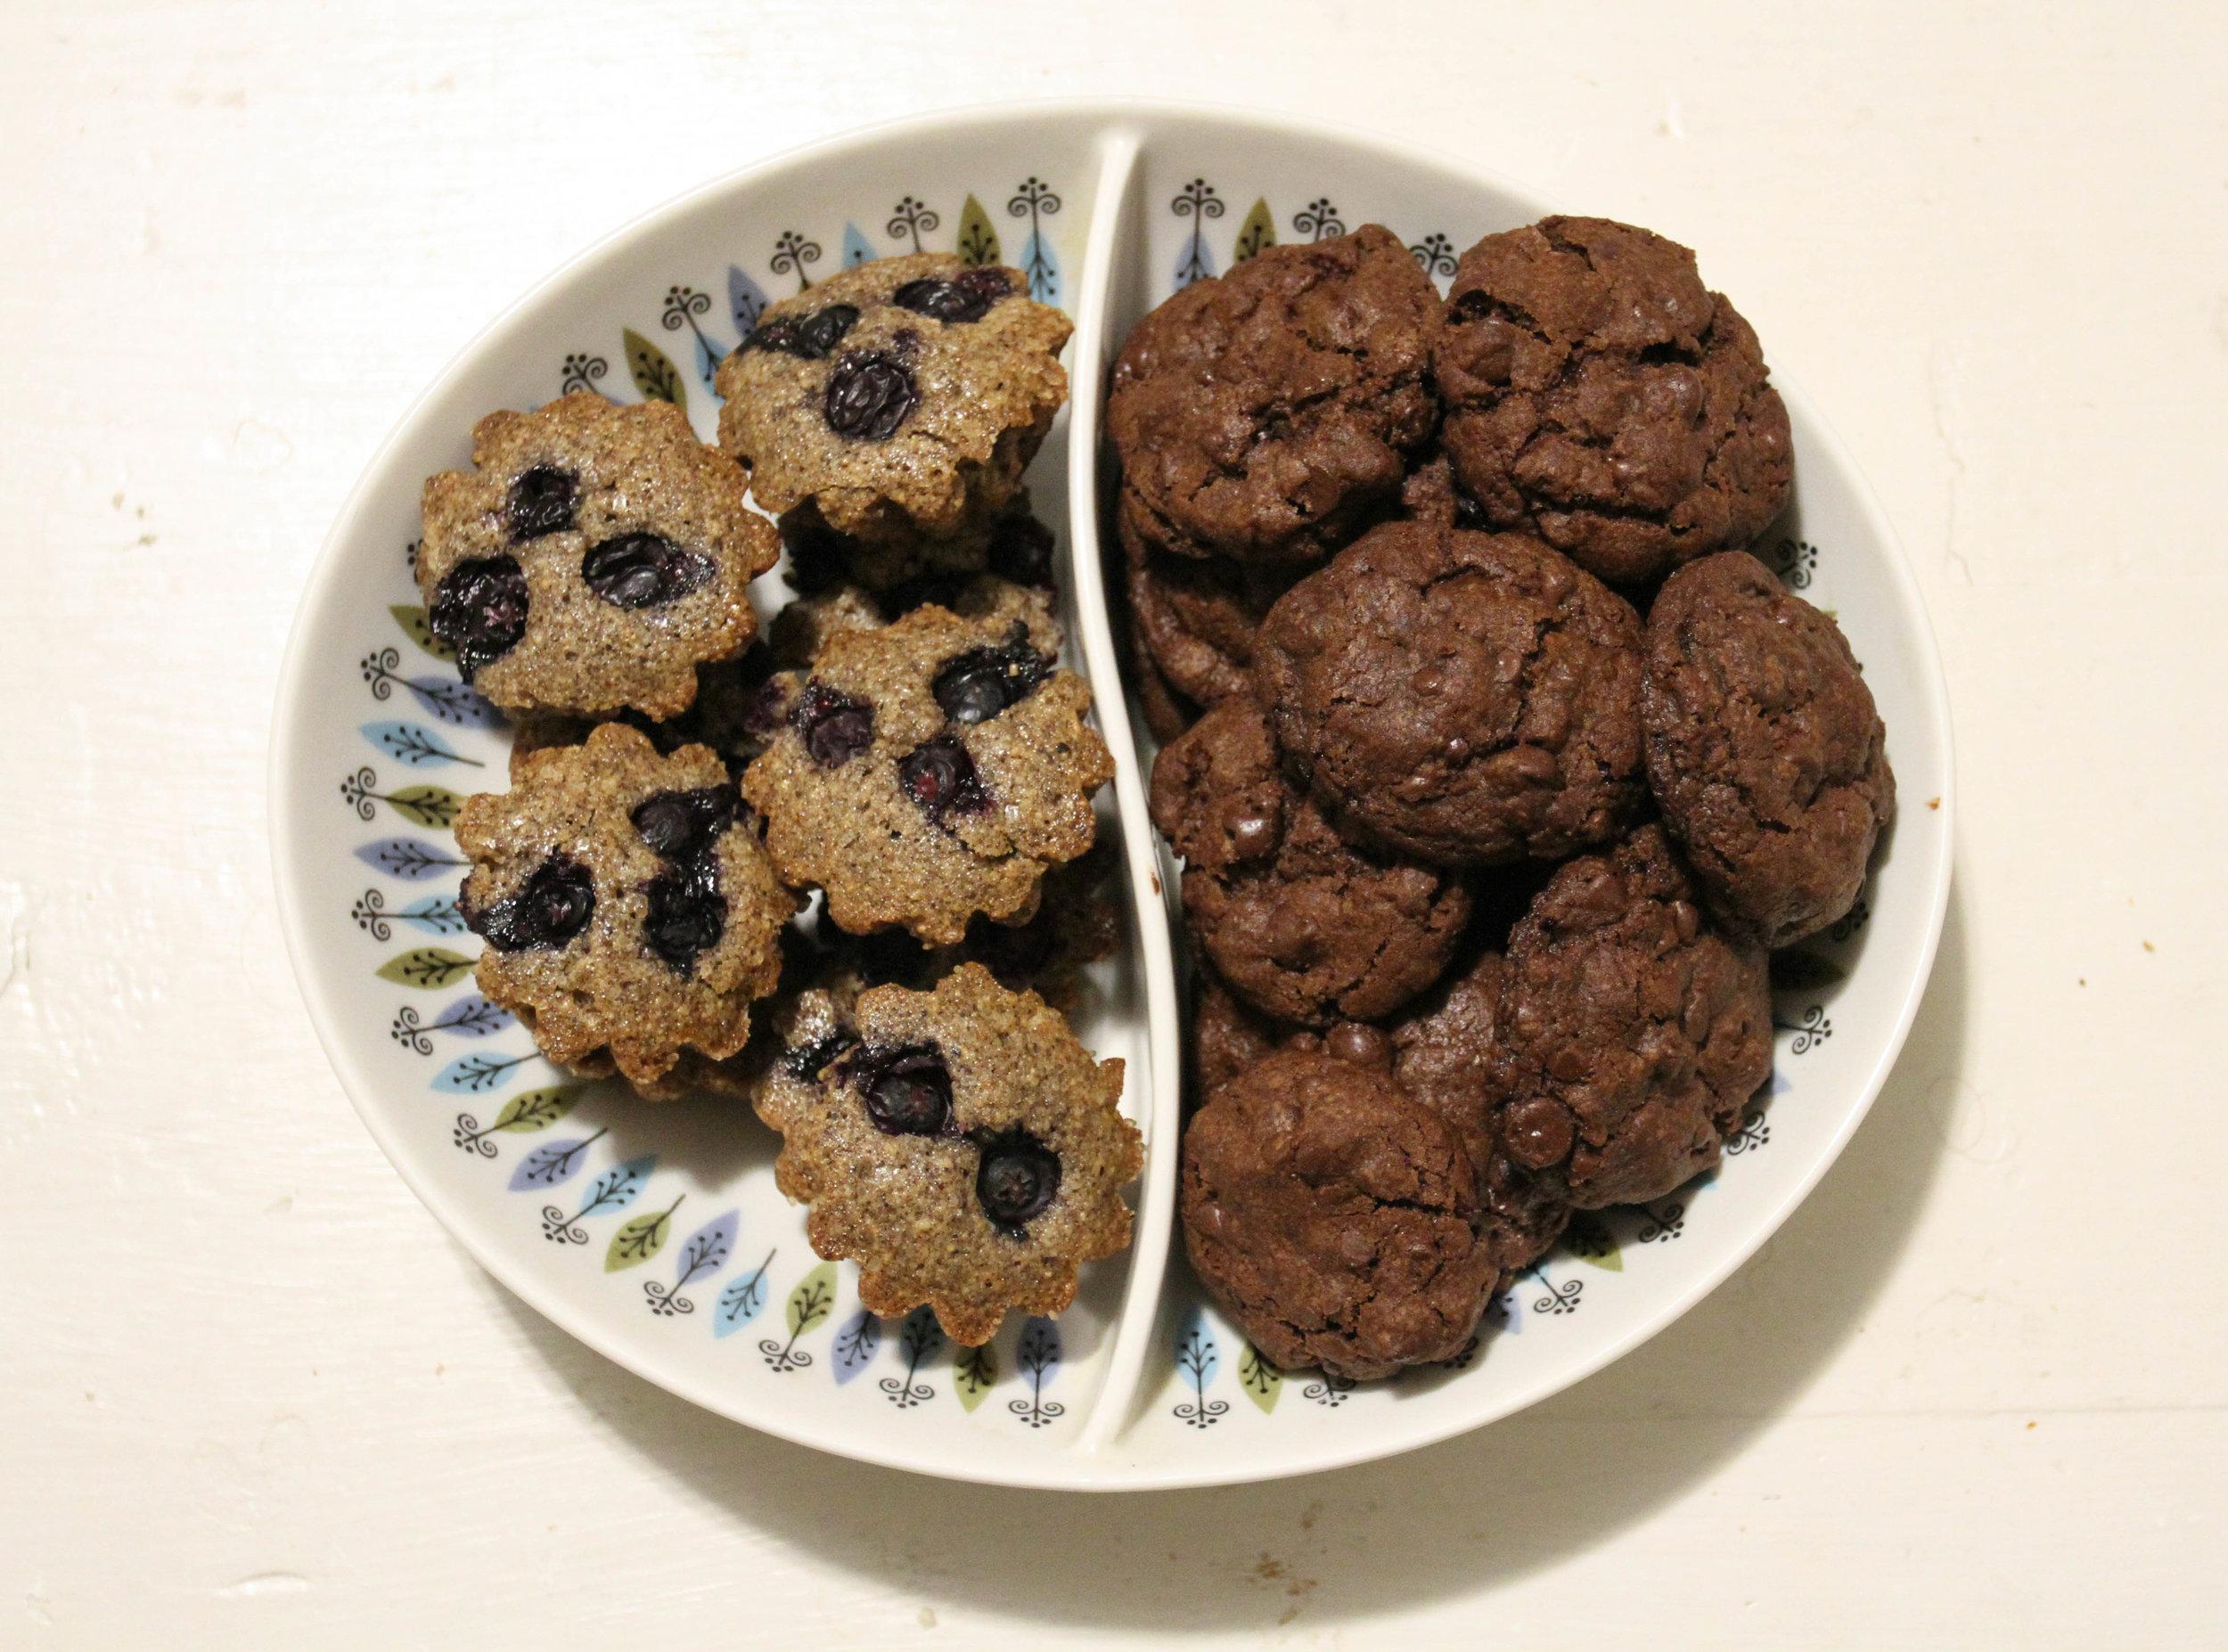 Buckwheat-blueberry financiers; Vahlrona chocolate cookies.